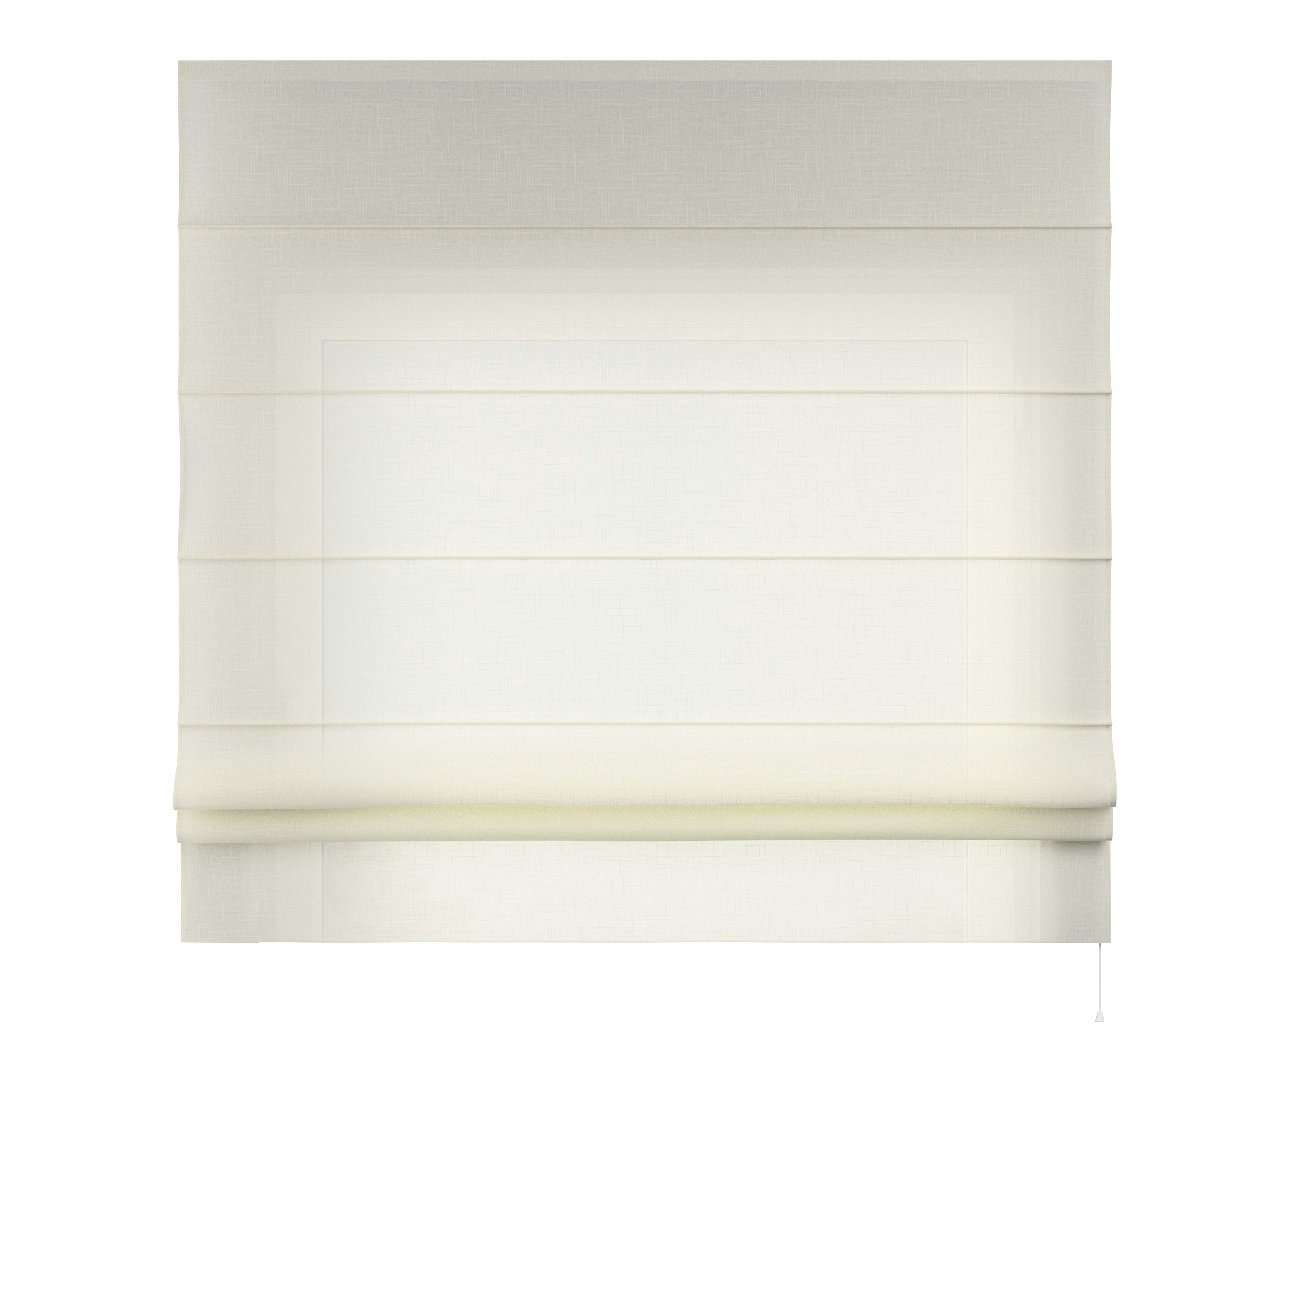 Foldegardin Paris<br/>Med lige flæse 80 x 170 cm fra kollektionen Romantik, Stof: 128-88